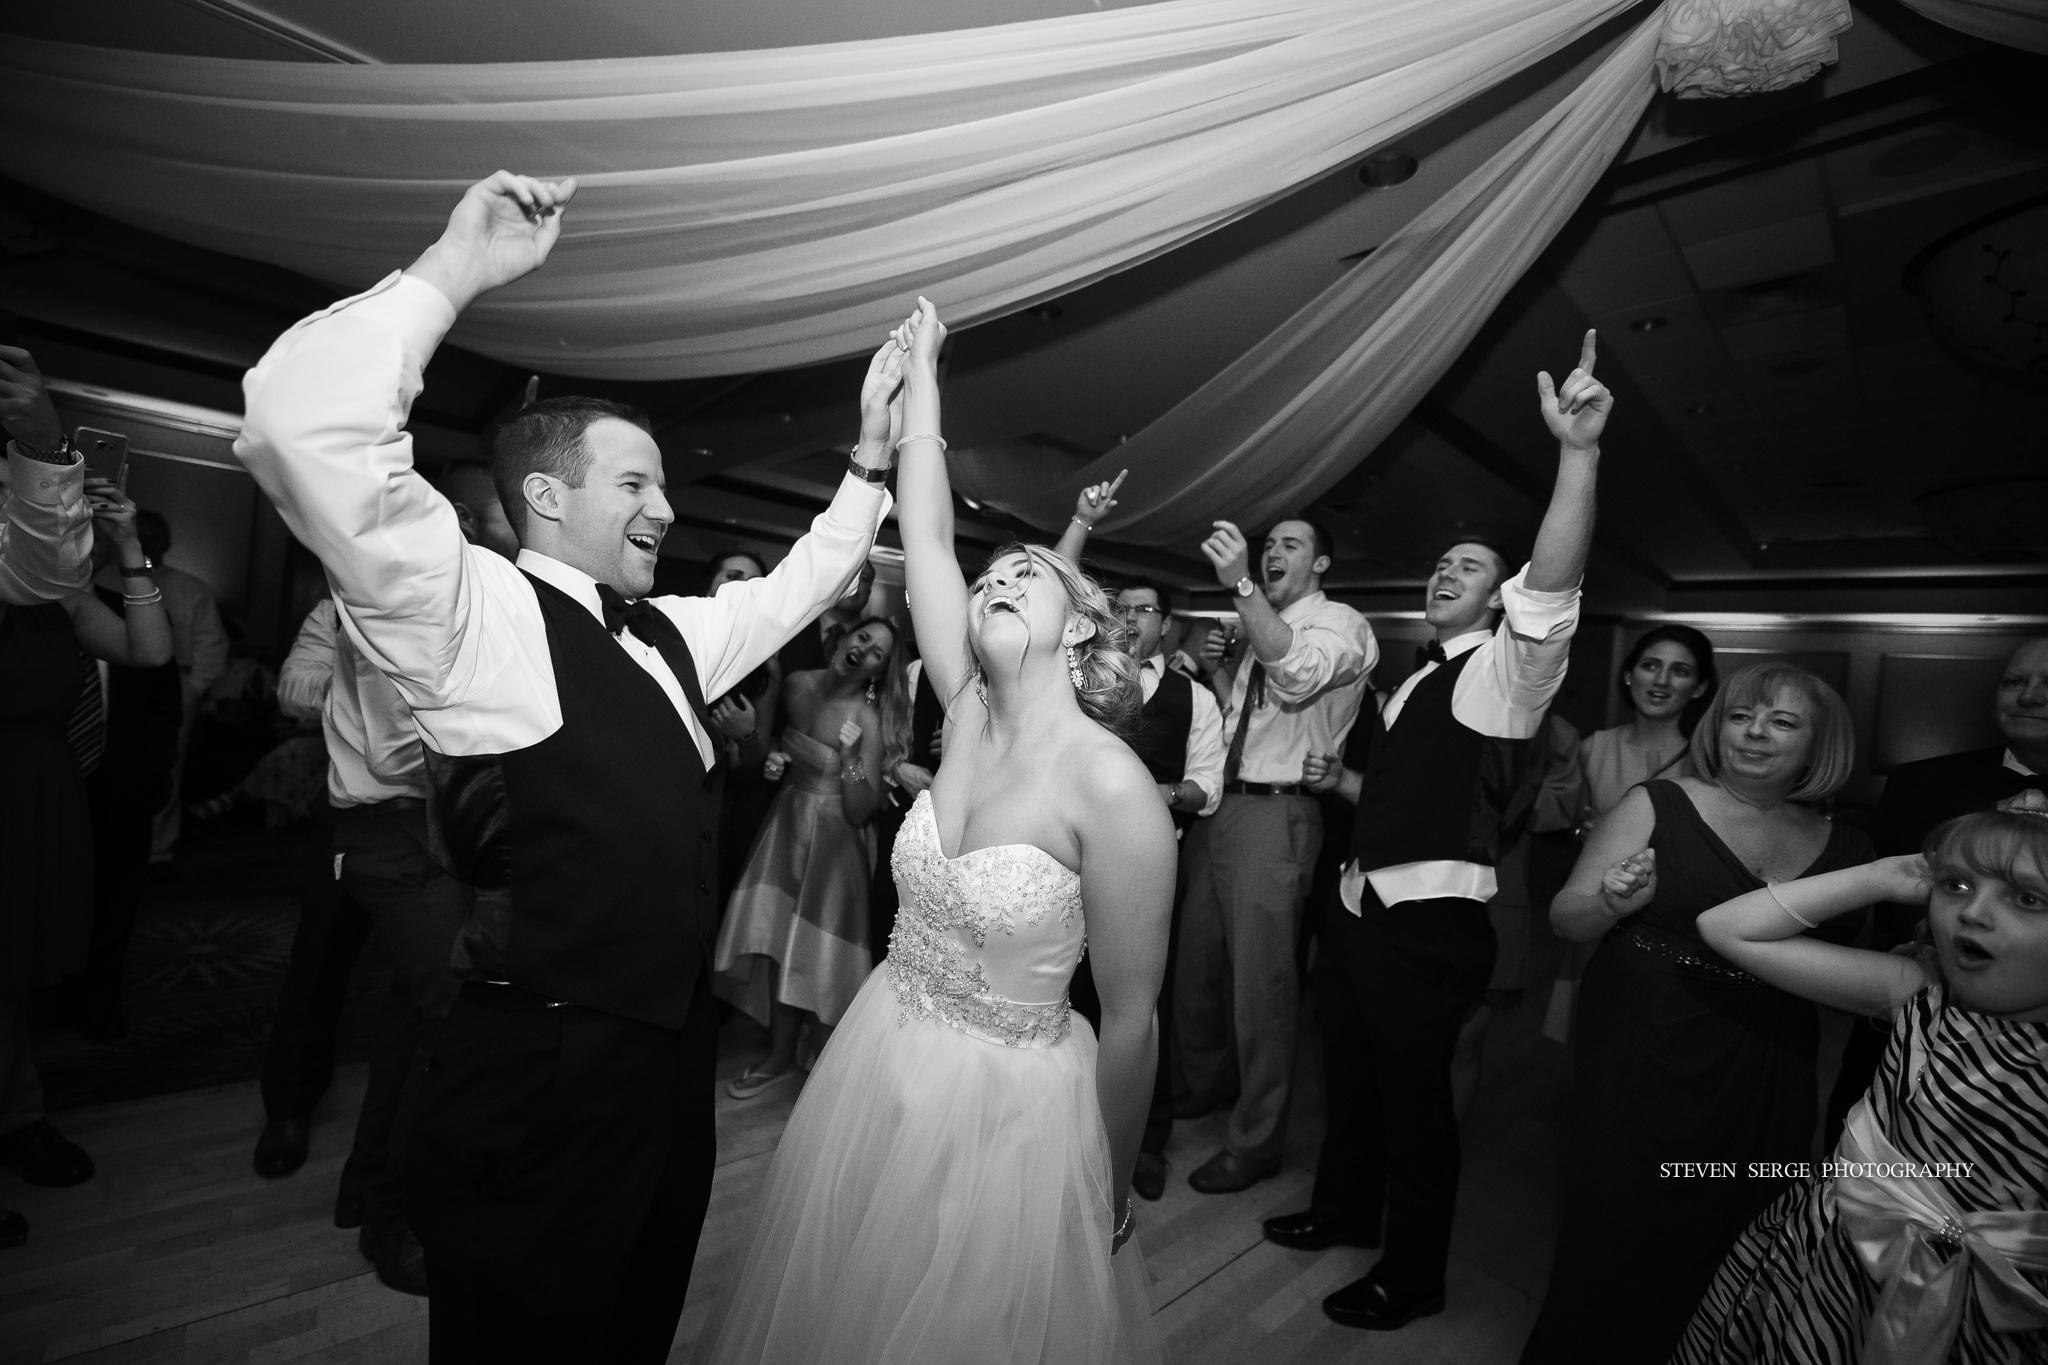 scranton-wedding-photographers-hilton-steven-serge-photography-44.jpg